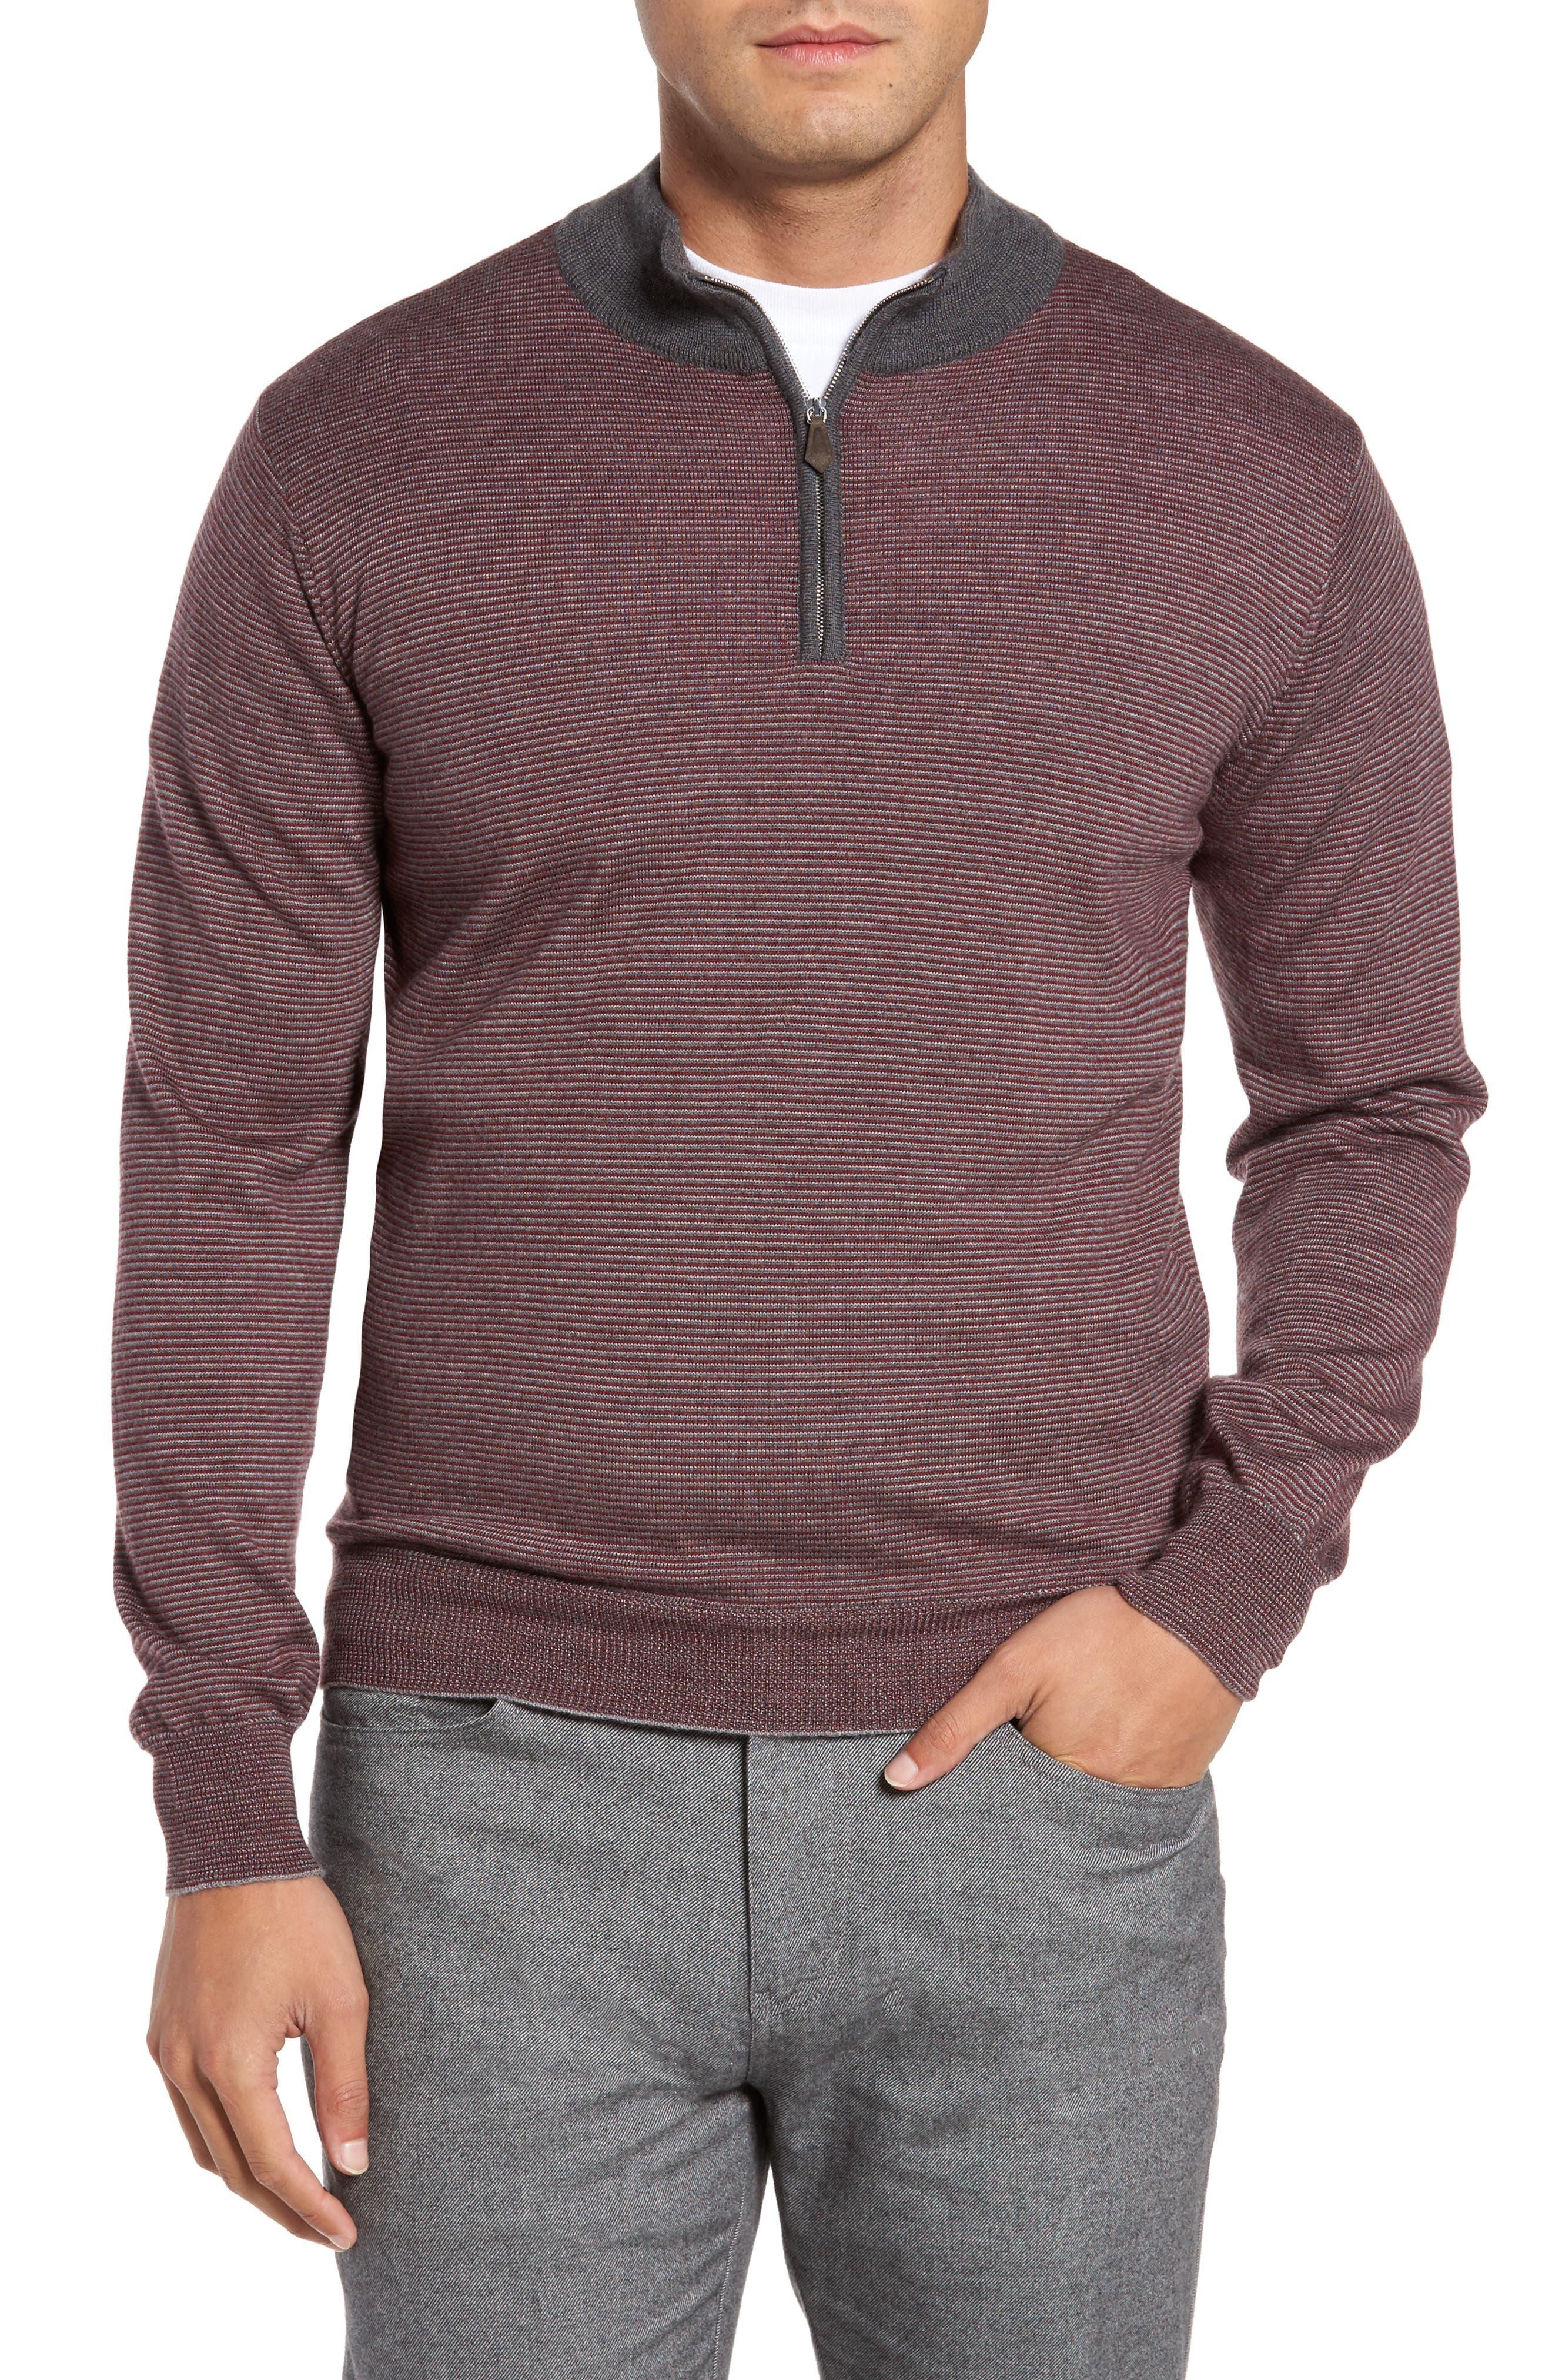 Trichrome Stripe Merino Wool Blend Sweater,                         Main,                         color, Chianti